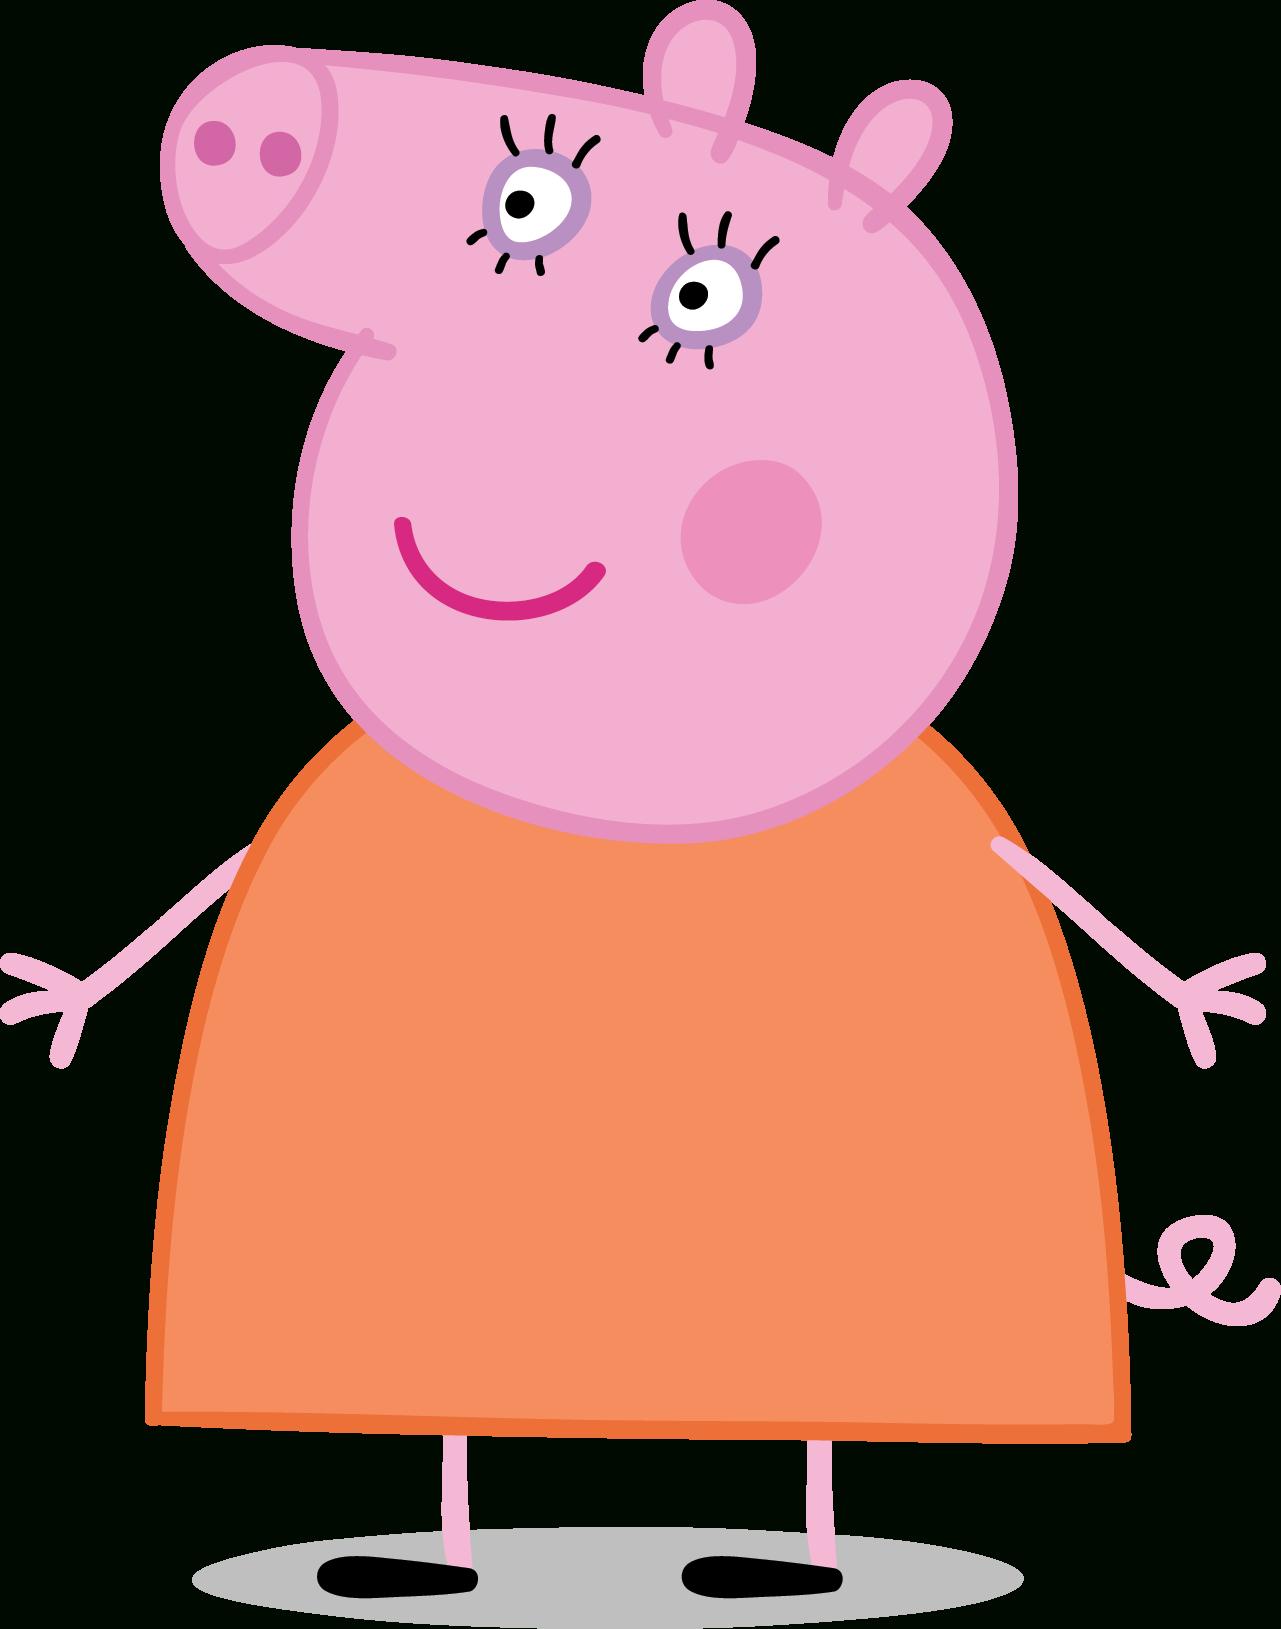 Peppa Pig Partner Toolkit - Peppa Pig Character Free Printable Images